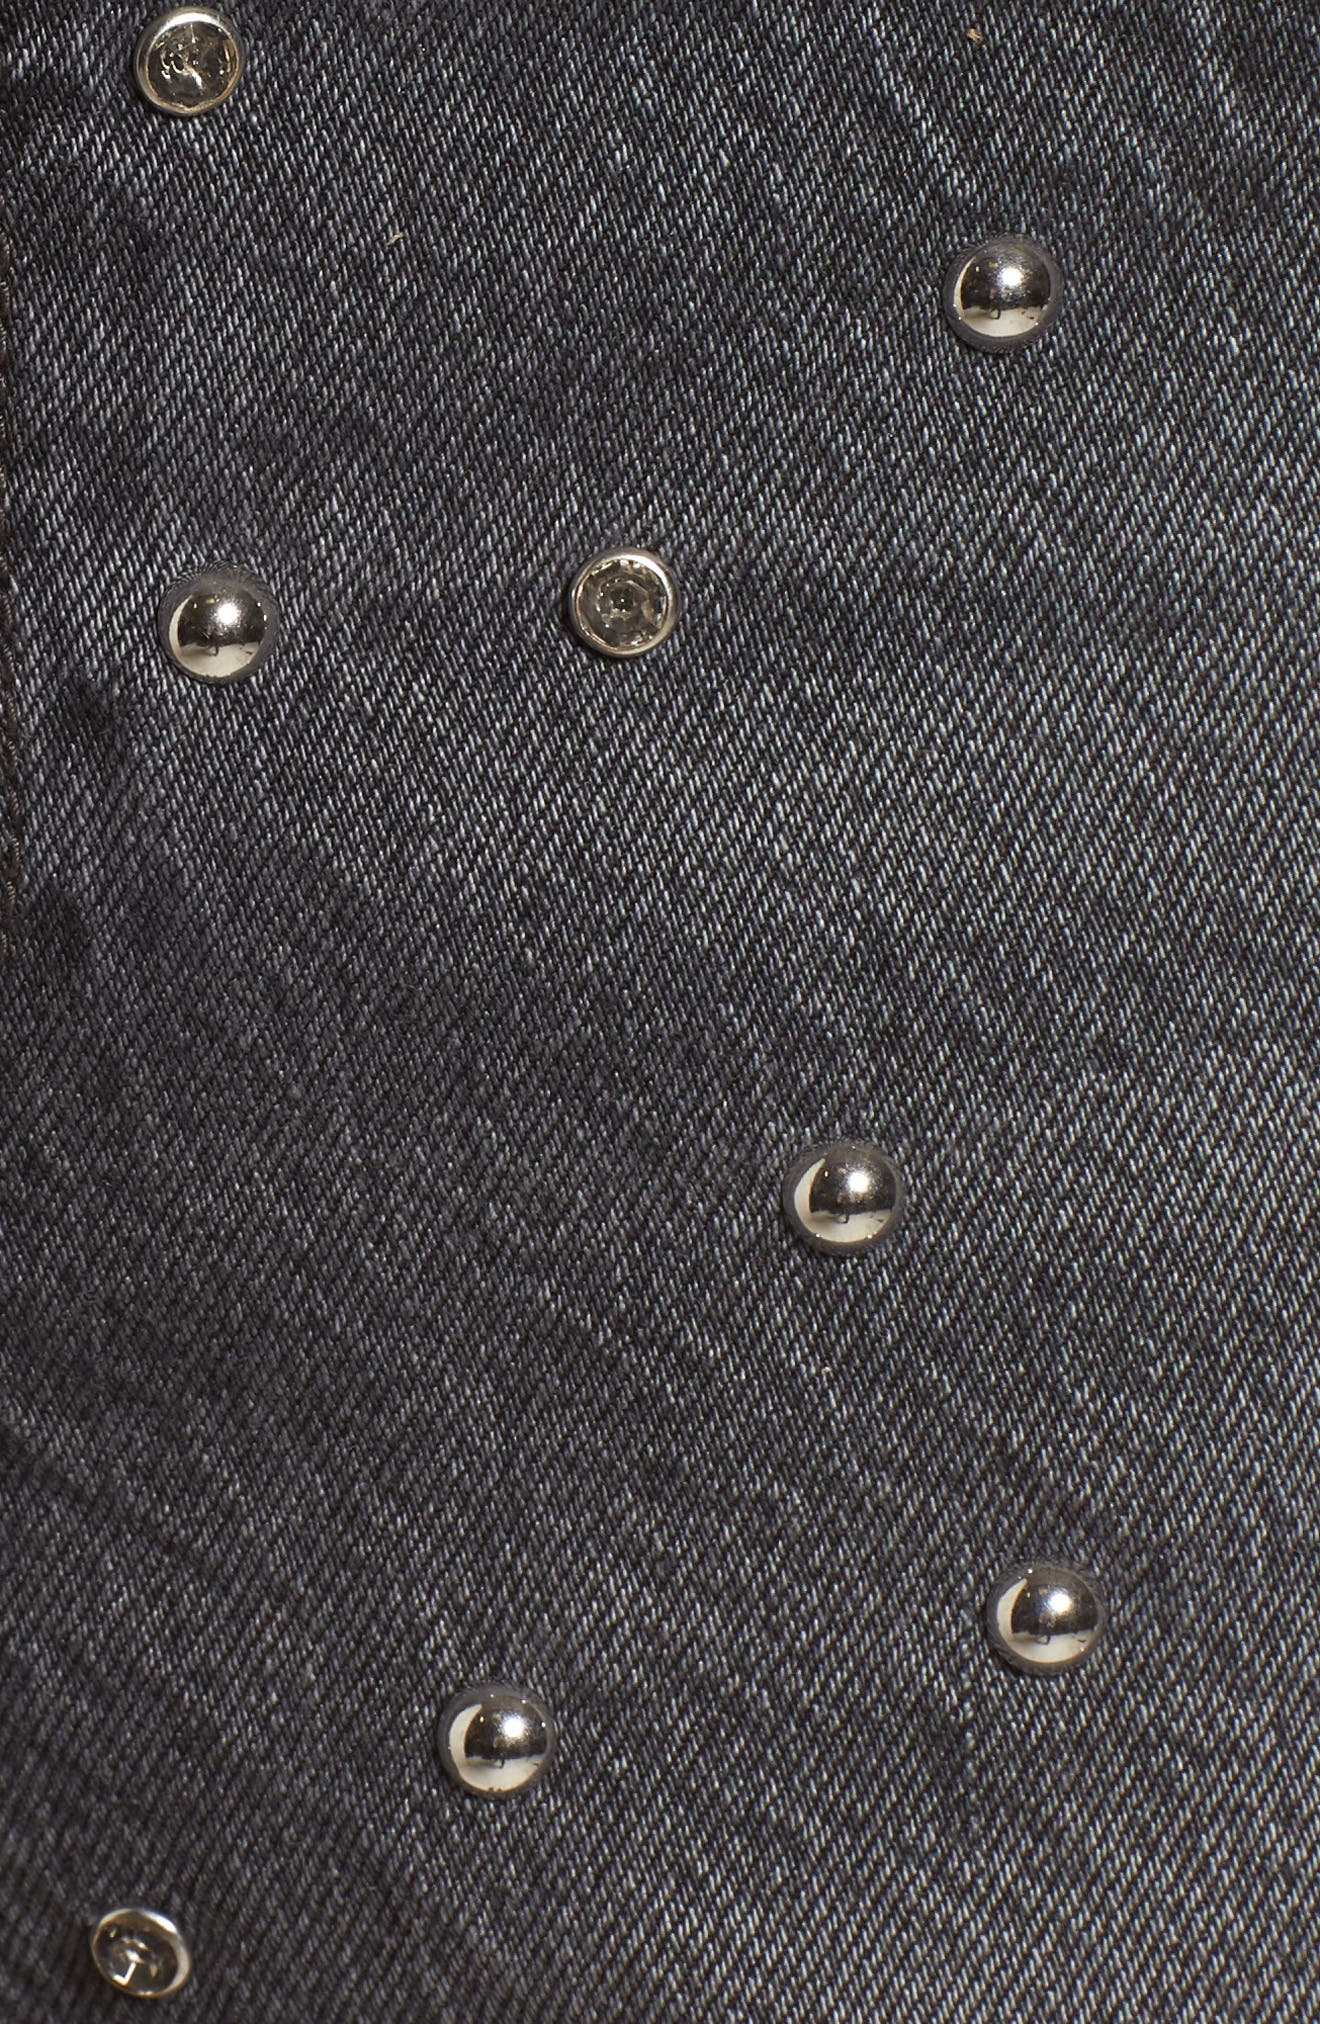 Wedgie High Waist Cutoff Denim Shorts,                             Alternate thumbnail 5, color,                             Bling Bling